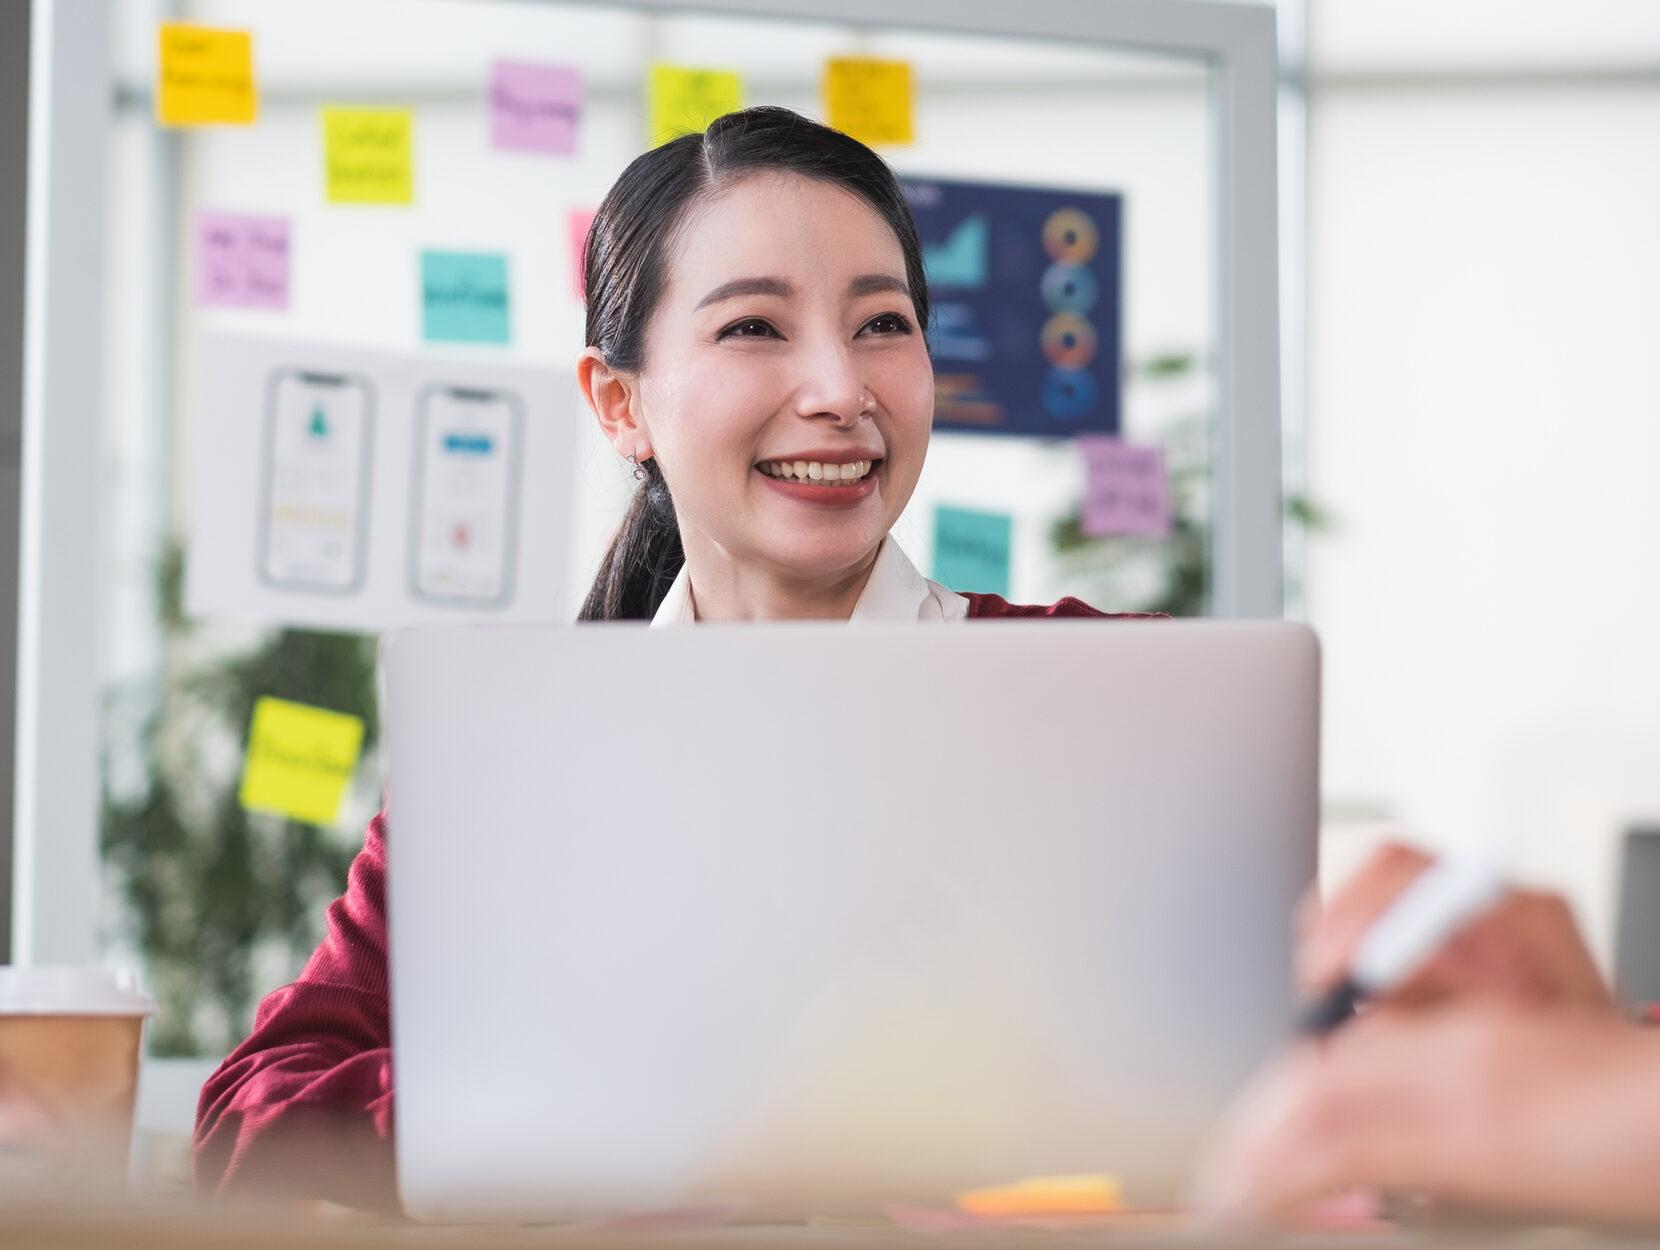 Female Web Developer Smiling At Work On Laptop Tech Job Interview